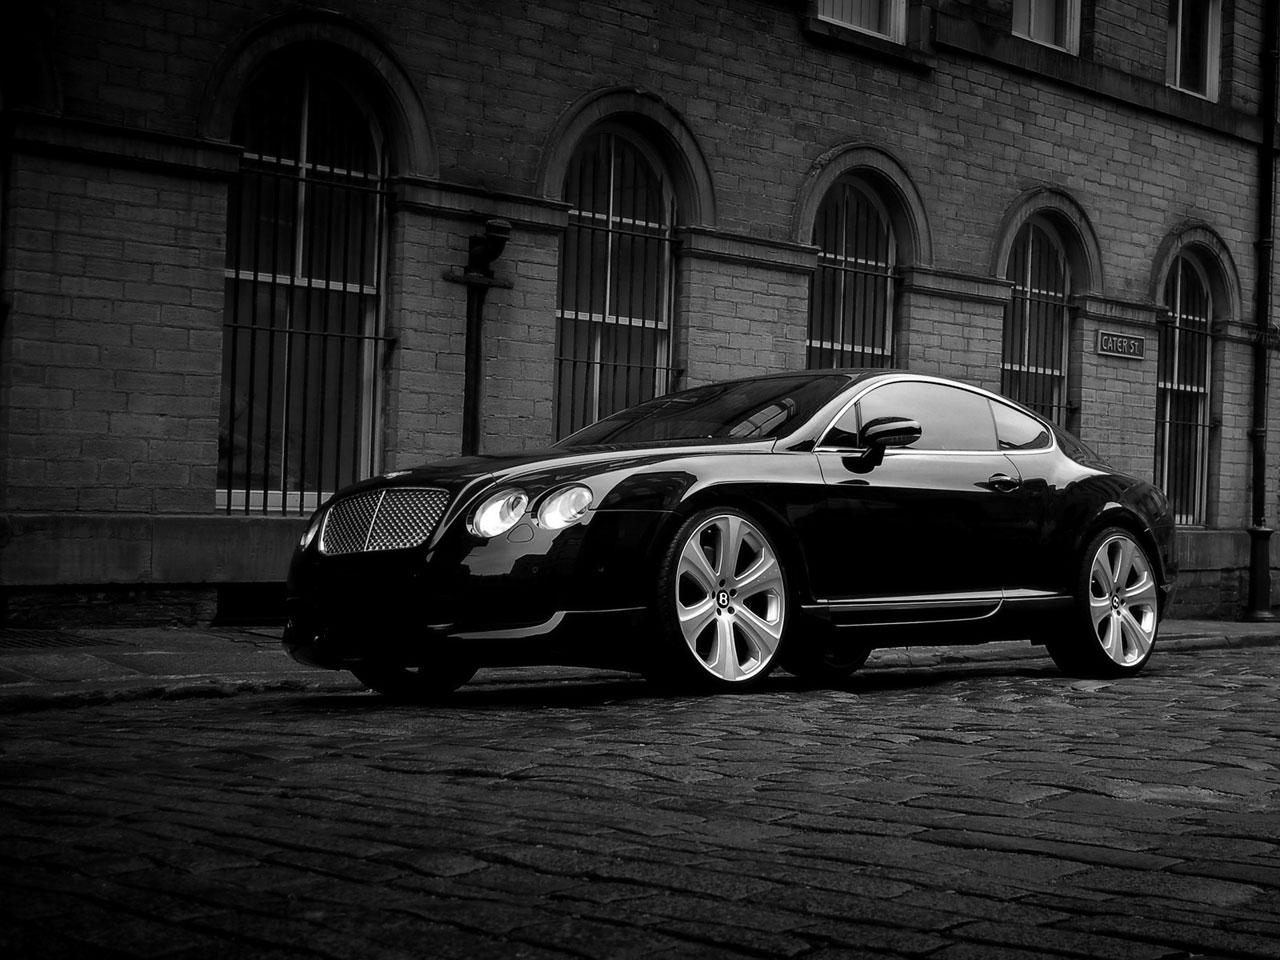 http://2.bp.blogspot.com/-nq1-3txFdAY/TcLwpw5uqyI/AAAAAAAAB1w/UNXhgmXs8fc/s1600/Bentley_Continental_GT-S.jpg